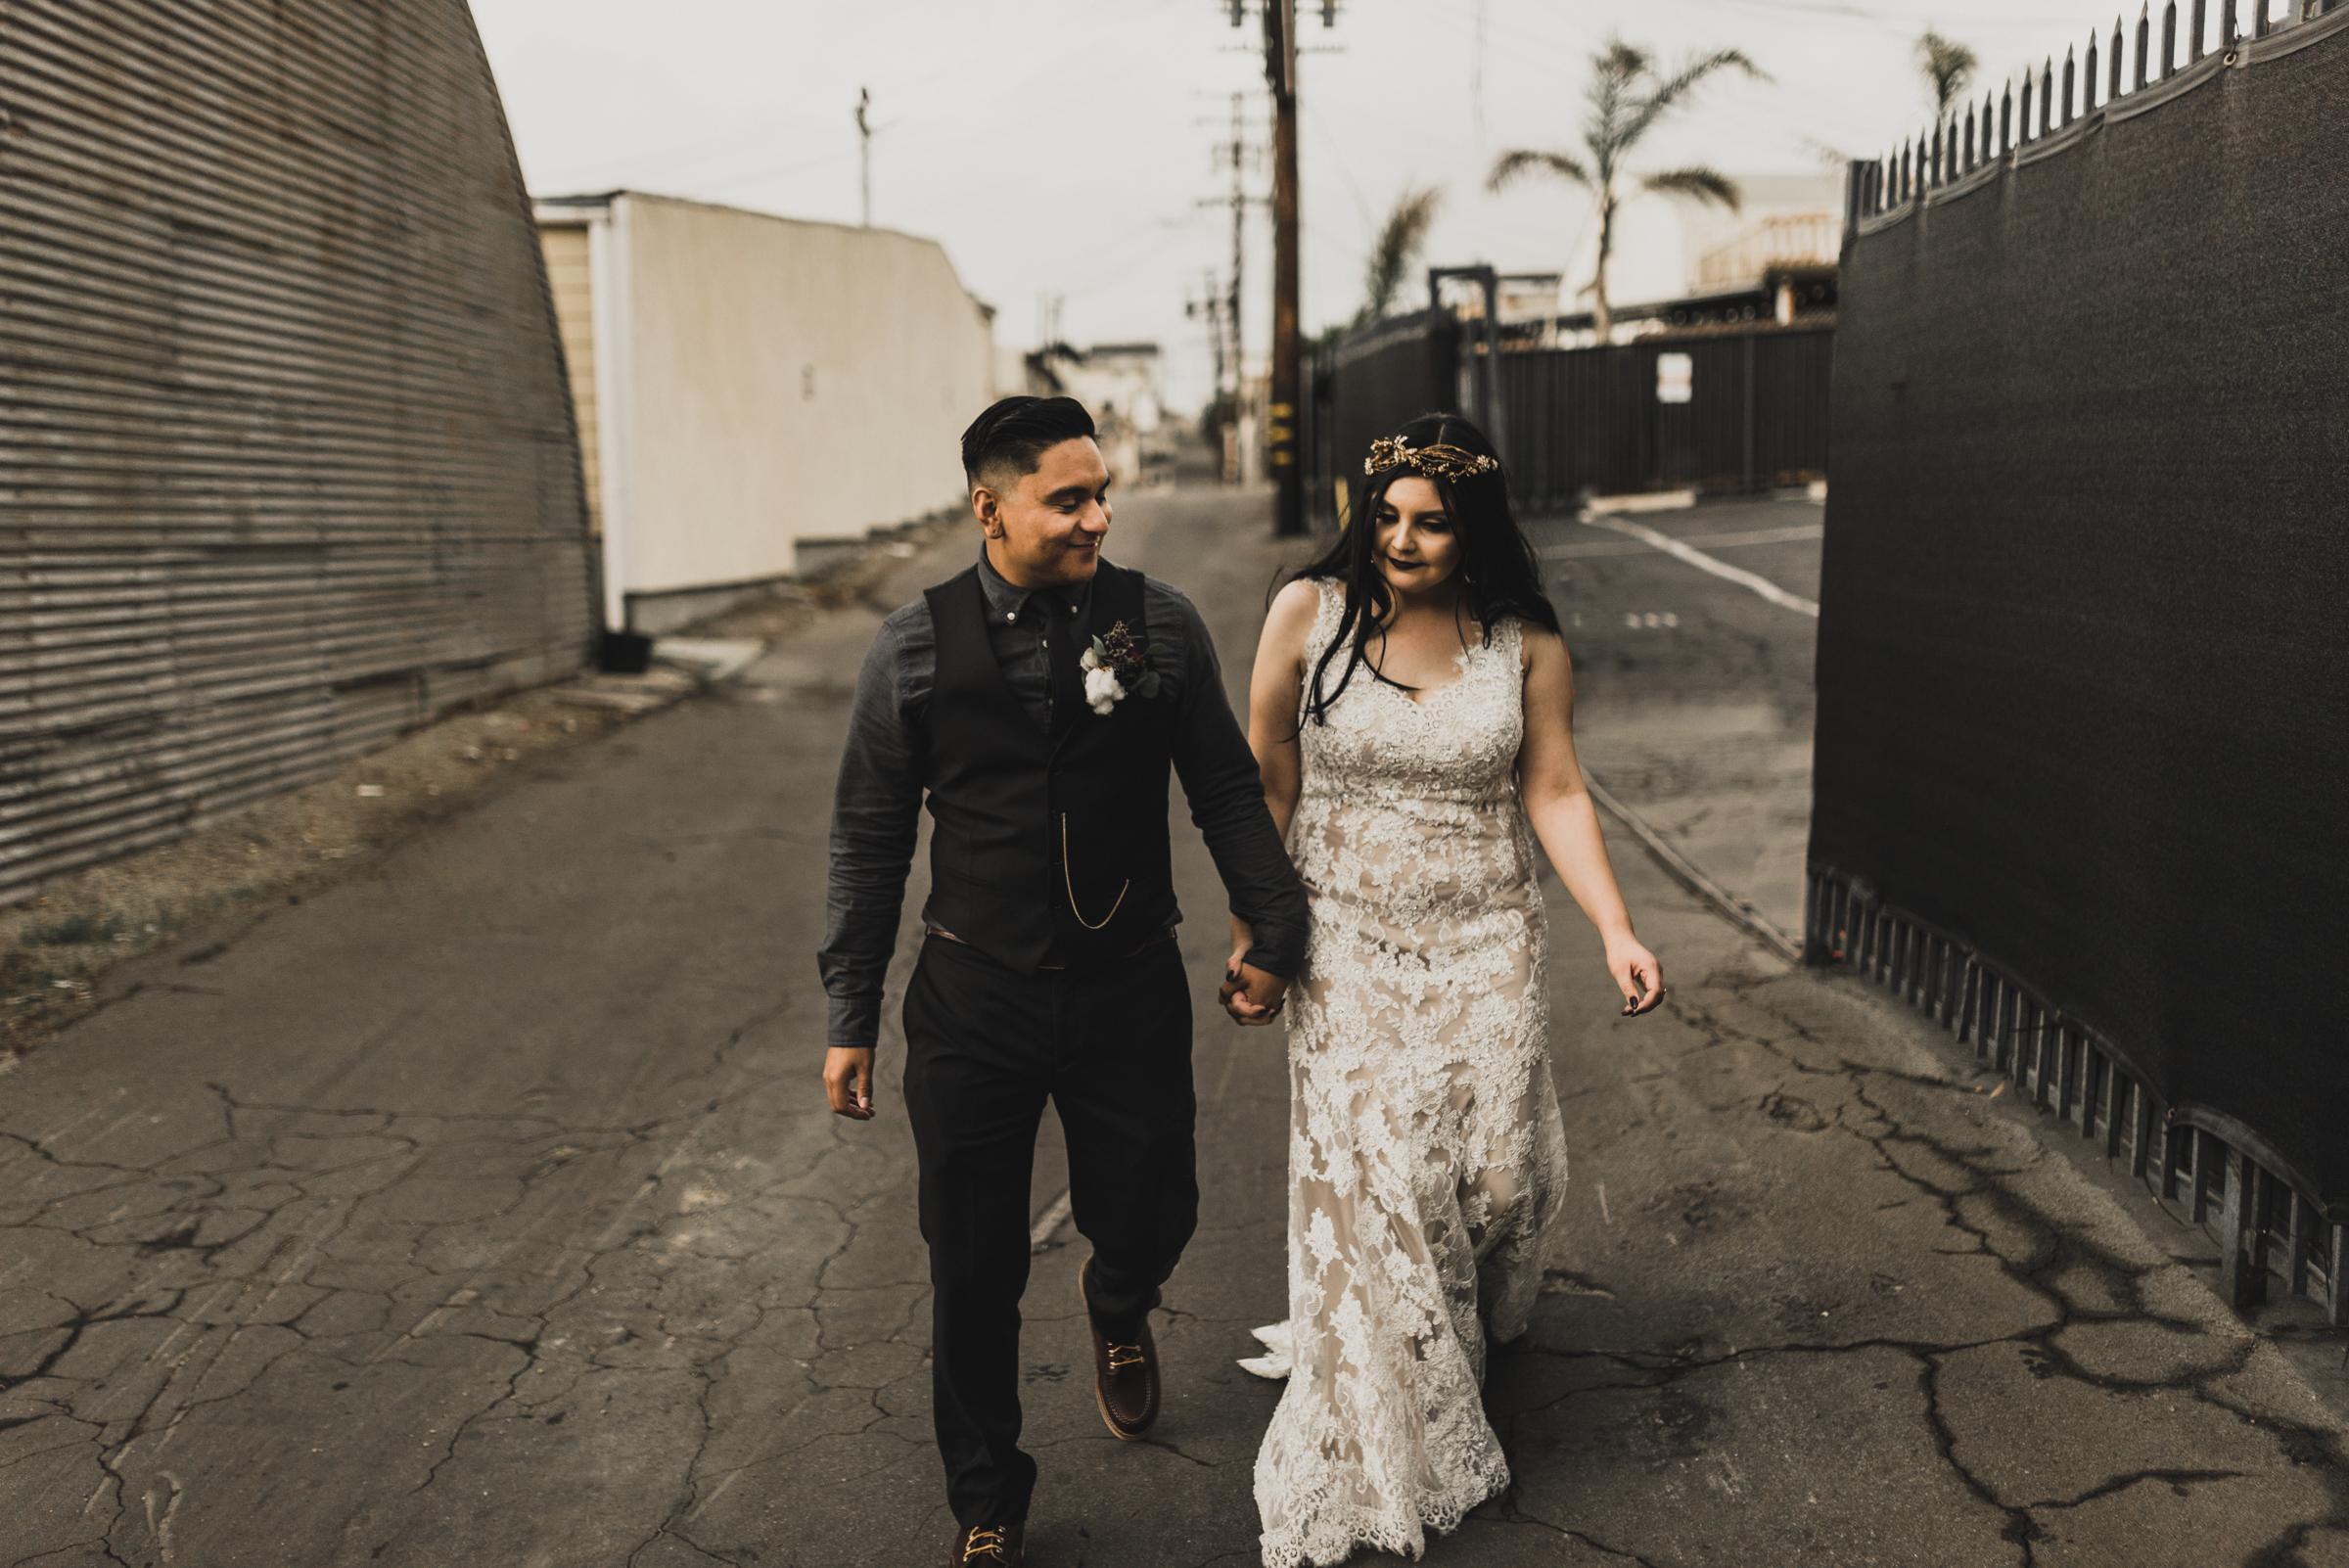 ©Isaiah + Taylor Photography - Smoky Hollow Studios Wedding, El Segundo, Los Angeles Wedding Photographer-104.jpg